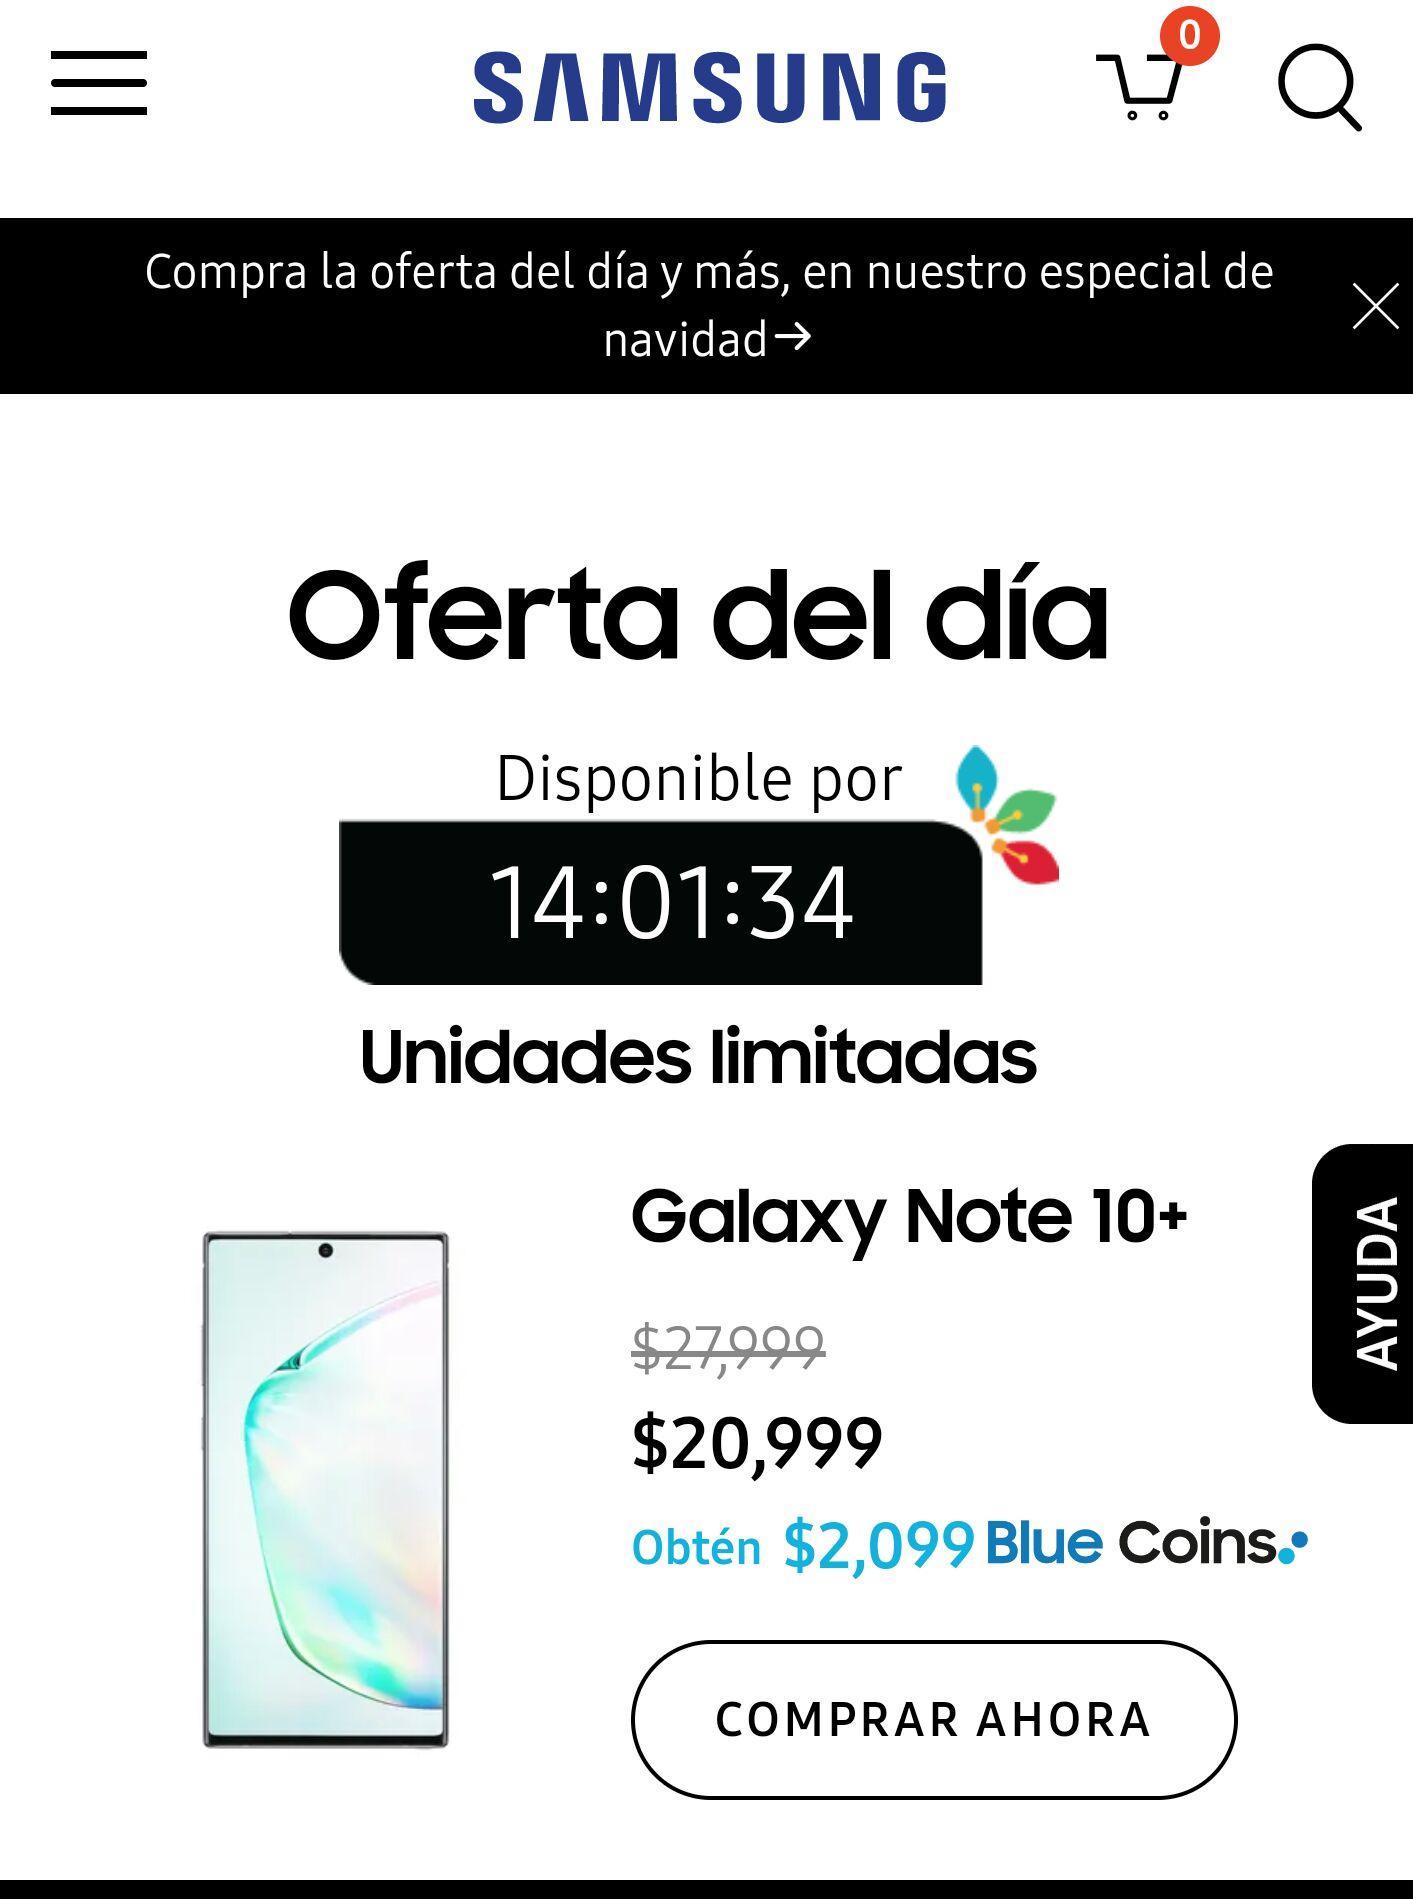 Samsung Store: Galaxy Note 10+